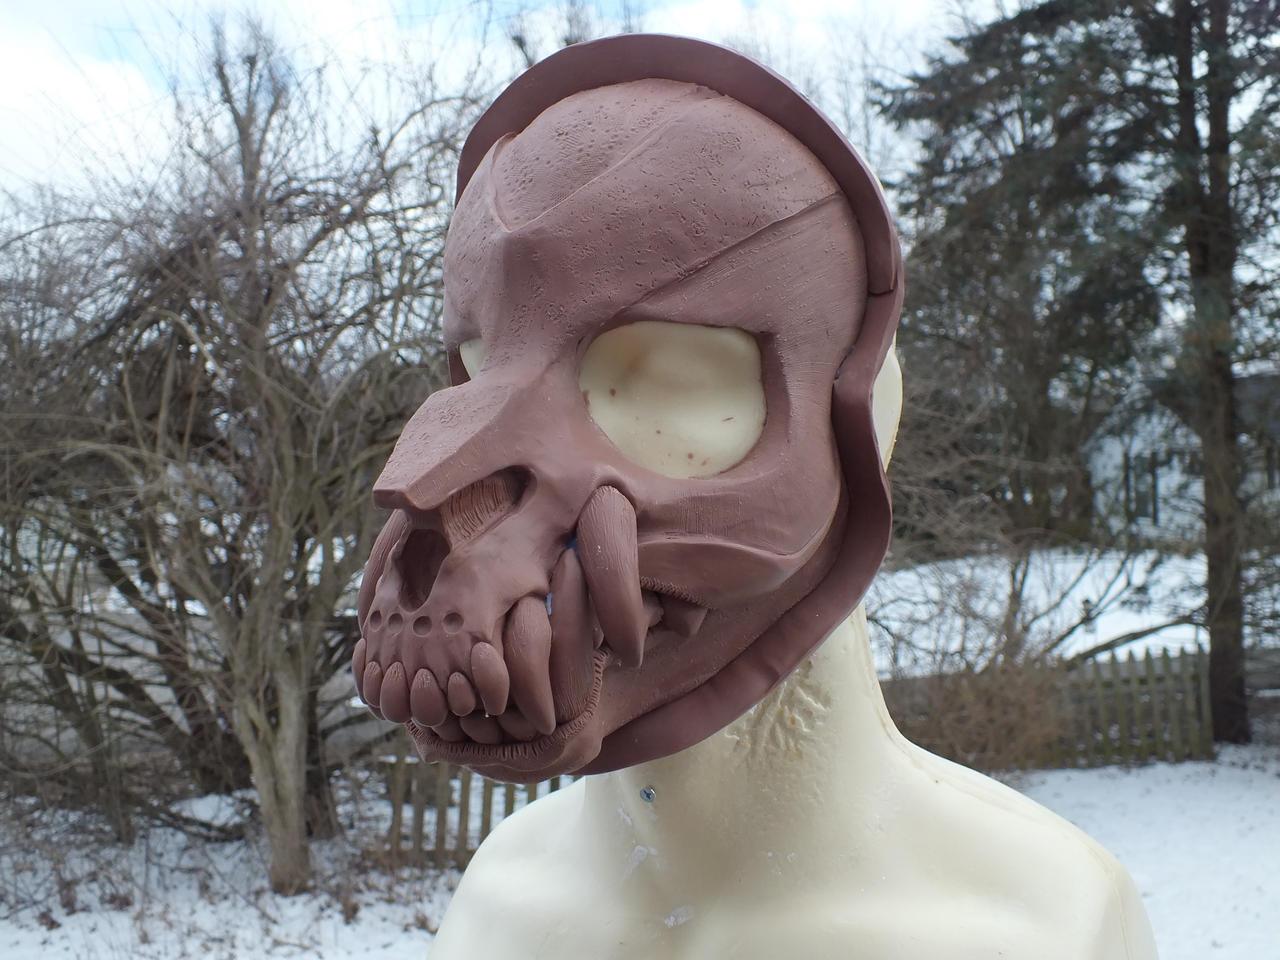 Master Sculpt-Mask by Blitzava